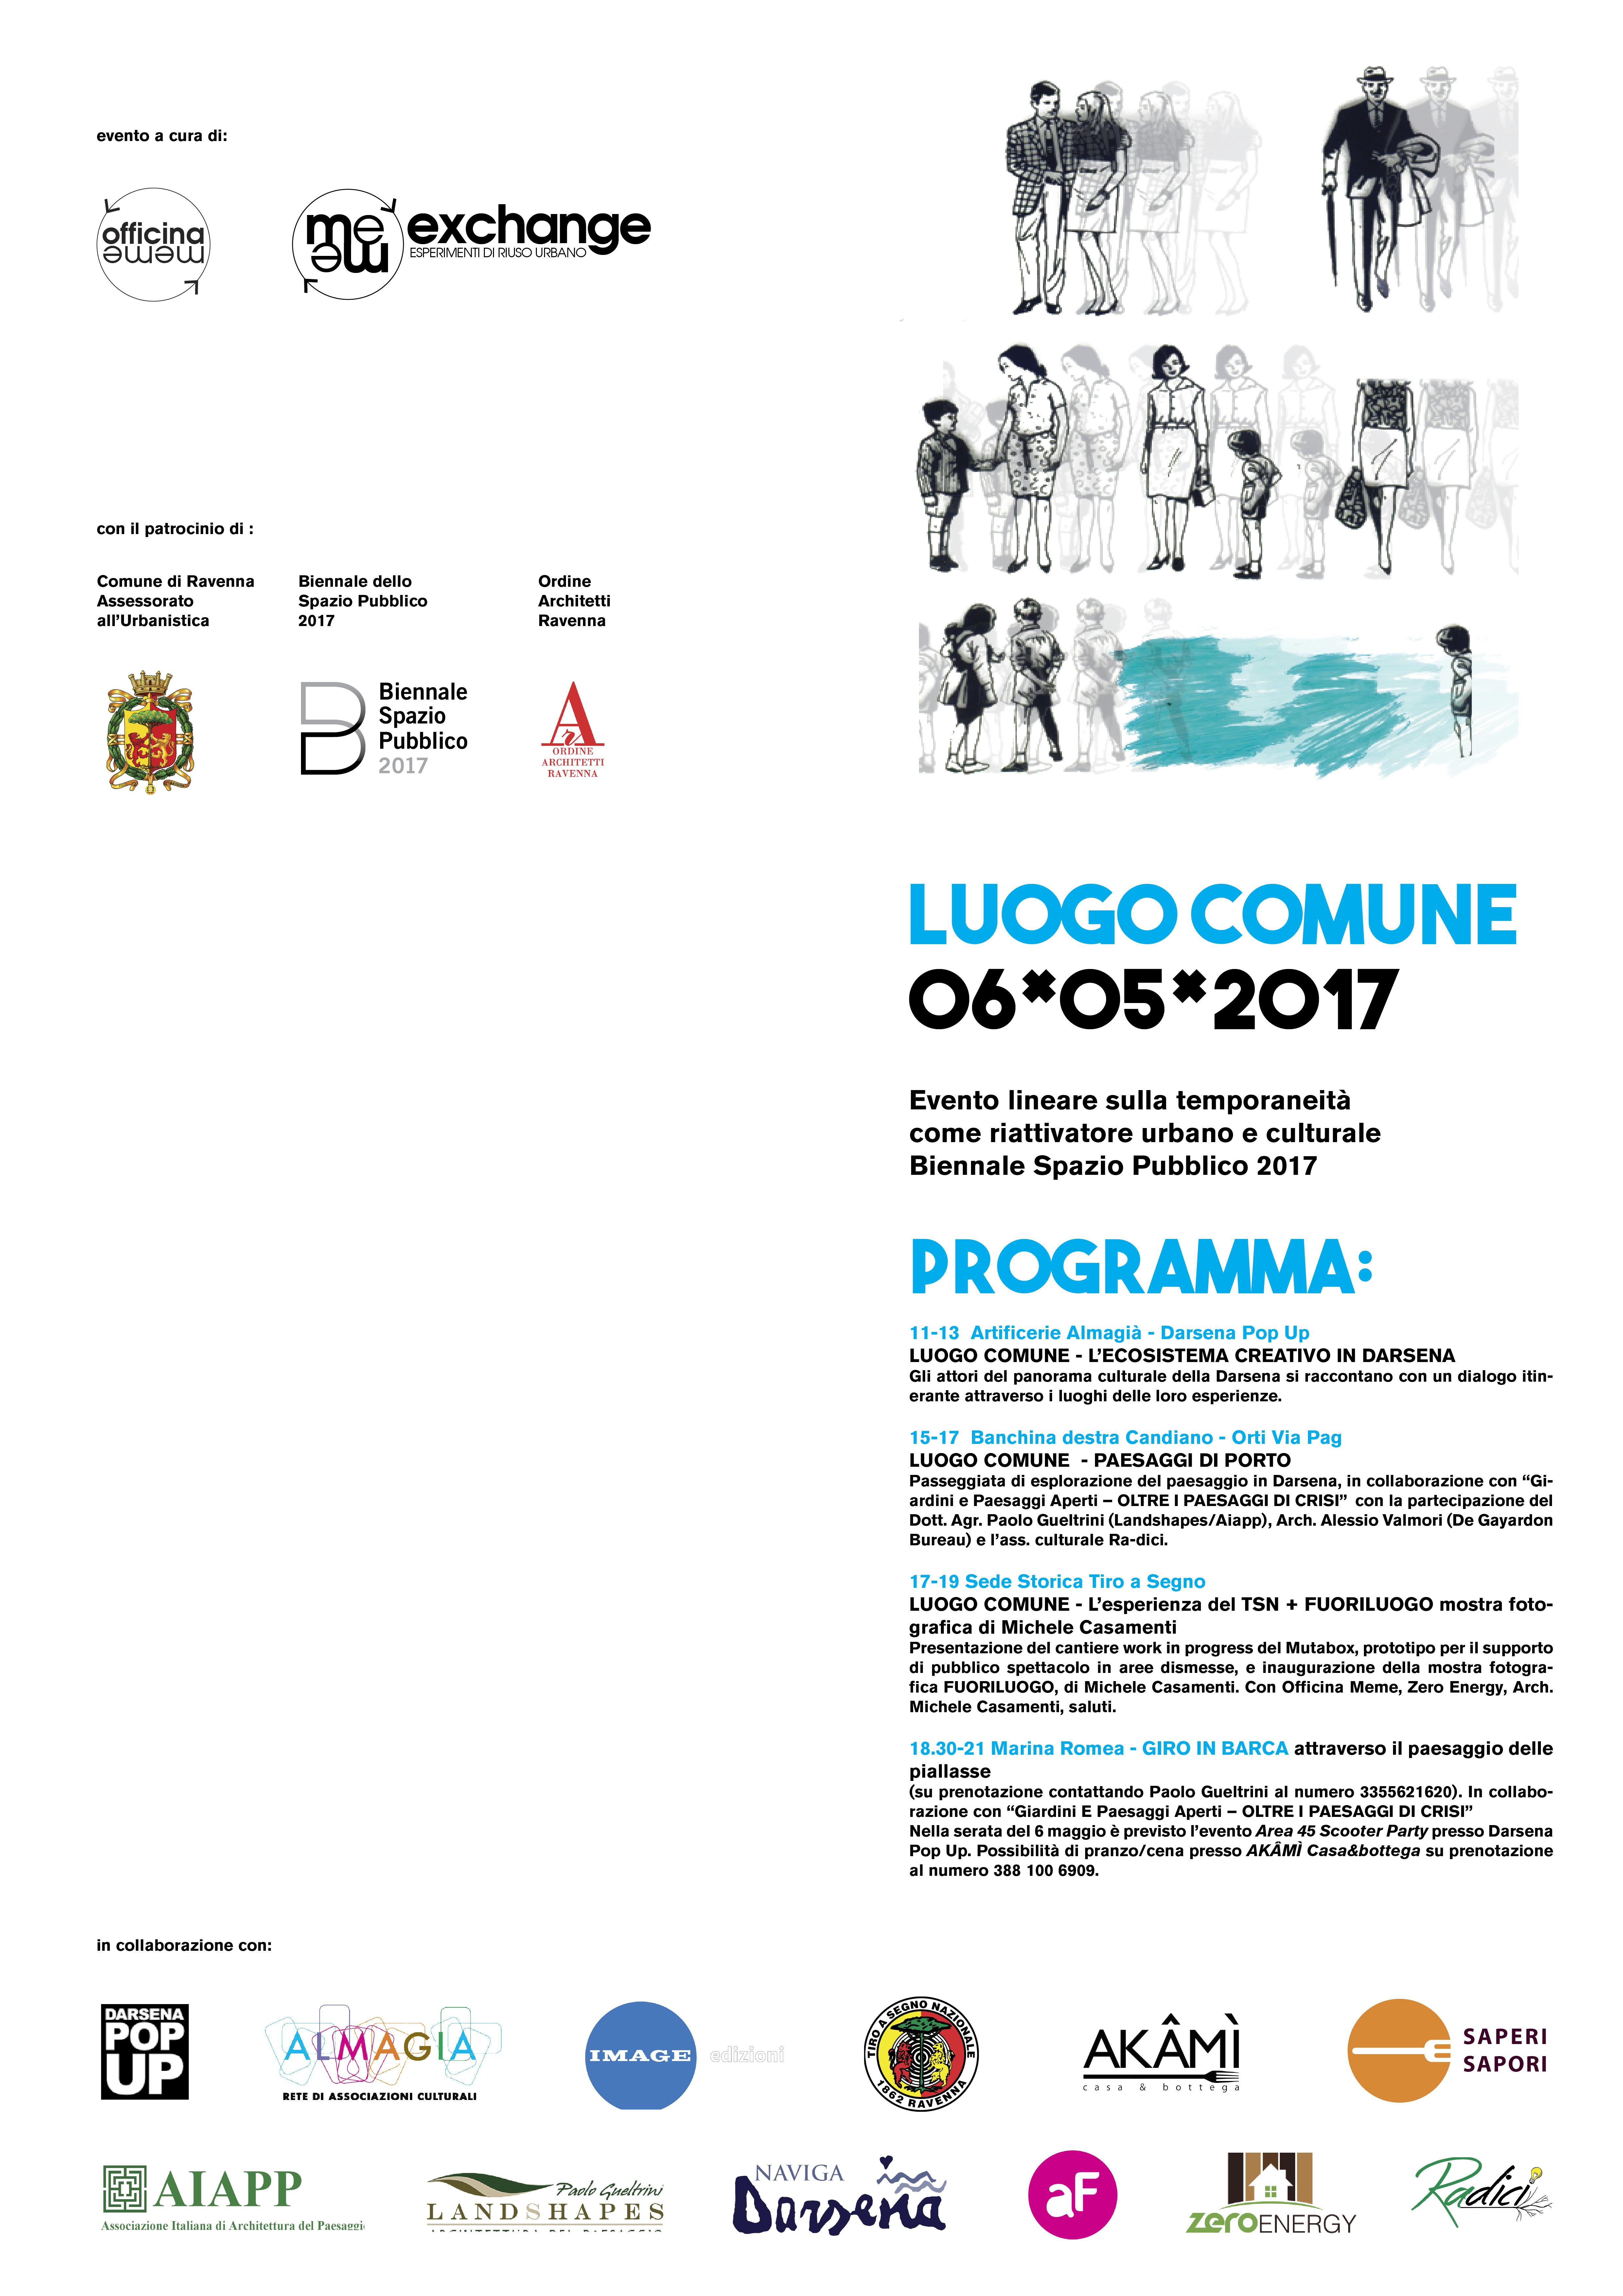 011_BSP_locandina programma